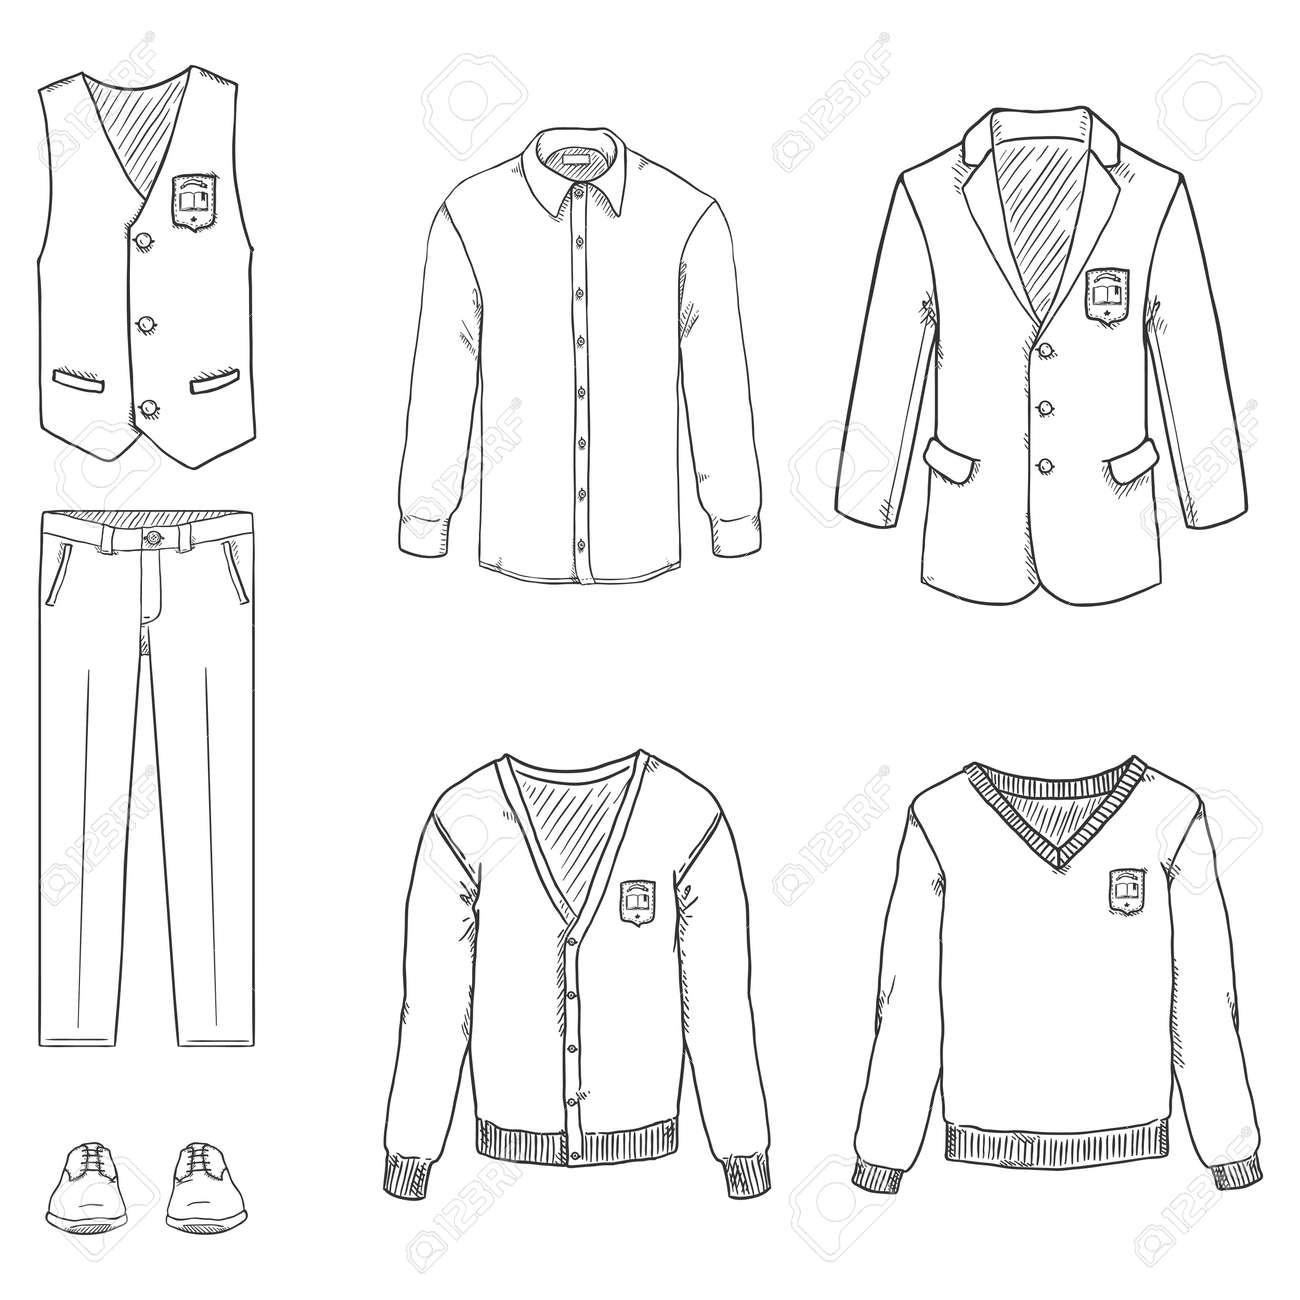 Vector Hand Drawn Sketch Set of School Uniform Clothes. - 169663681